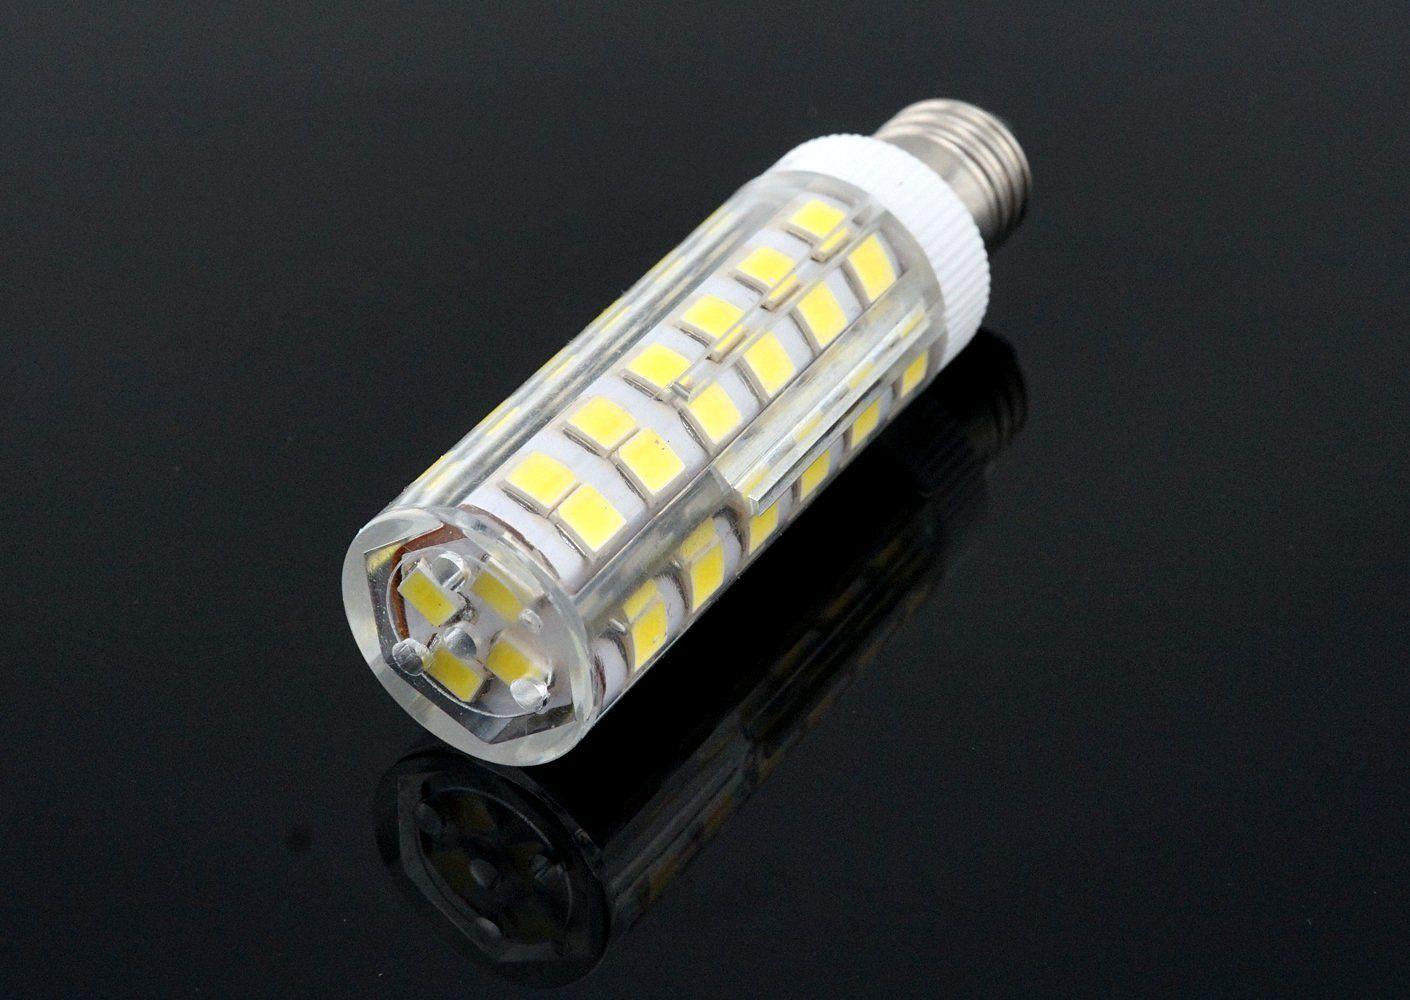 Bonlux 6w Dimmable E11 Led Light Bulb 45w Halogen Bulbs Equivalent Mini Candelabra Base Daylight 6000k T3 T4 Omni Directional For Ceiling Fan